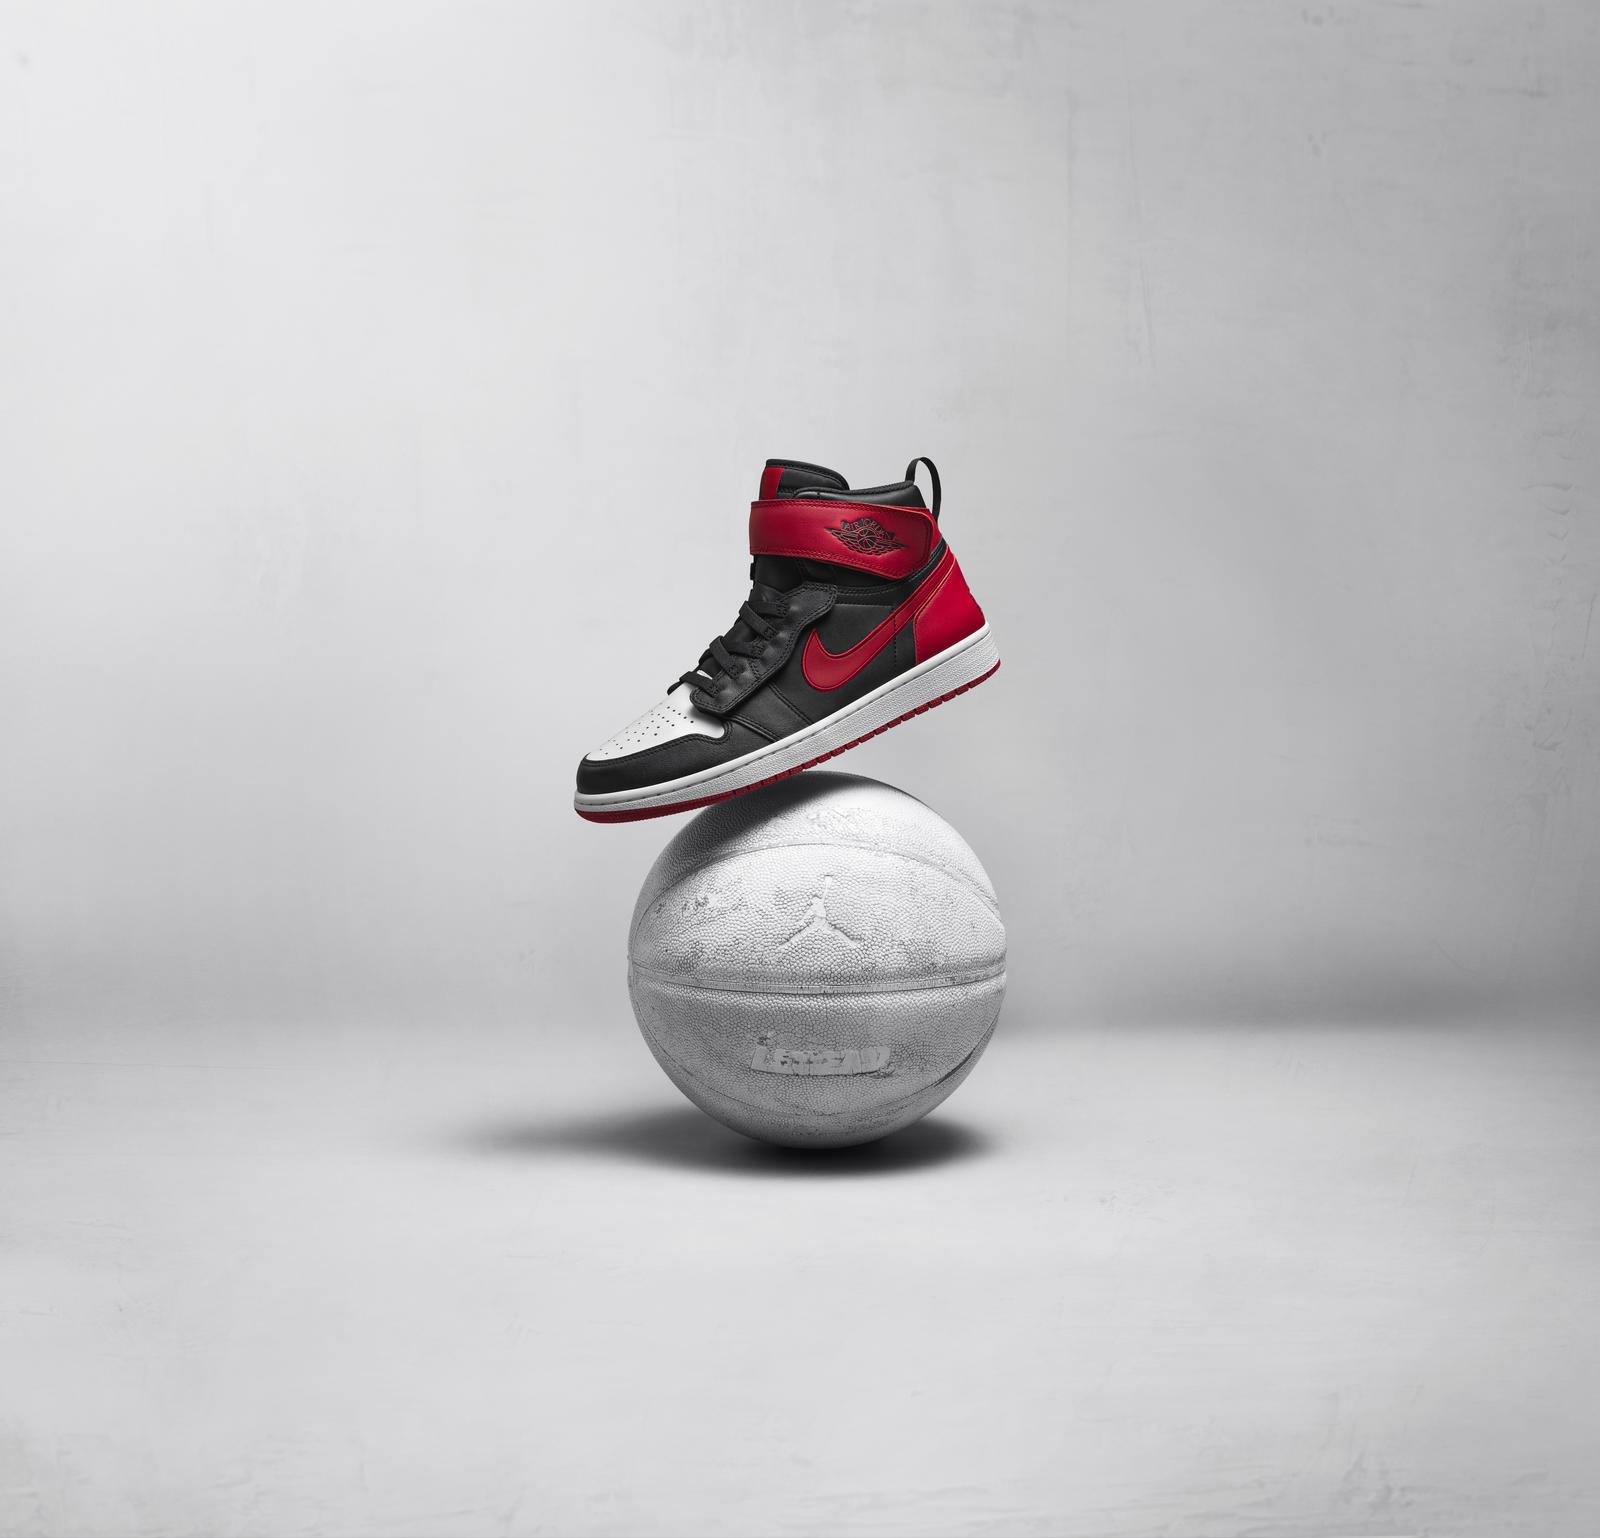 Jordan Brand Fearless Ones Air Jordan I Collection 36